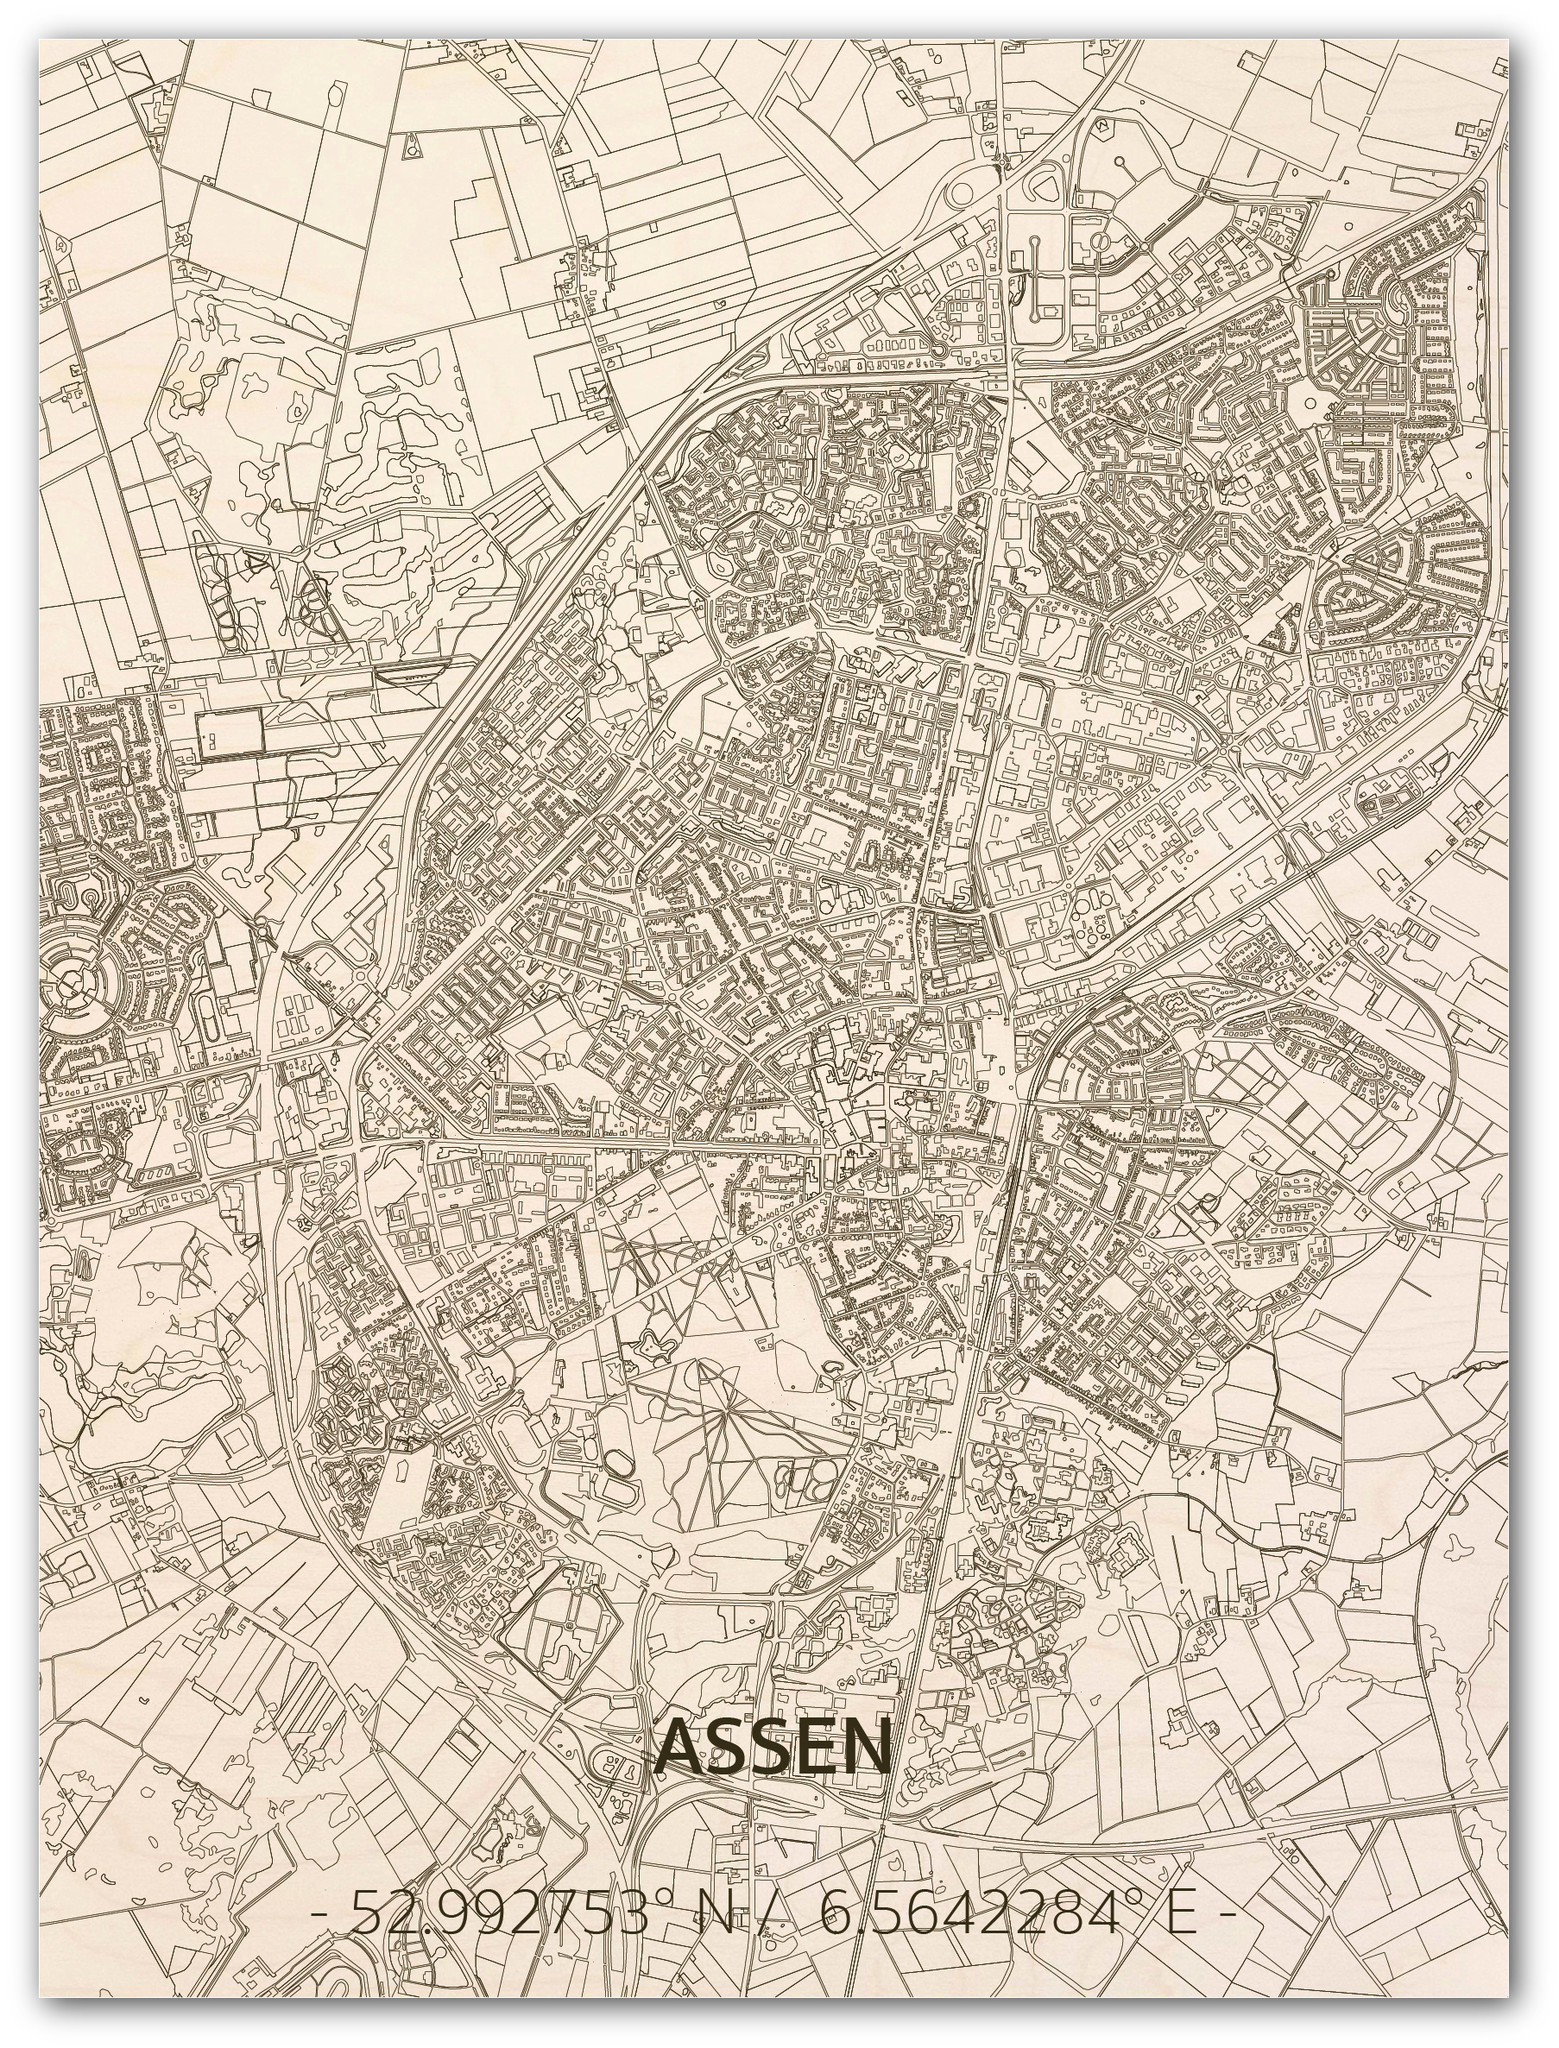 SALE | Assen | SALE-1